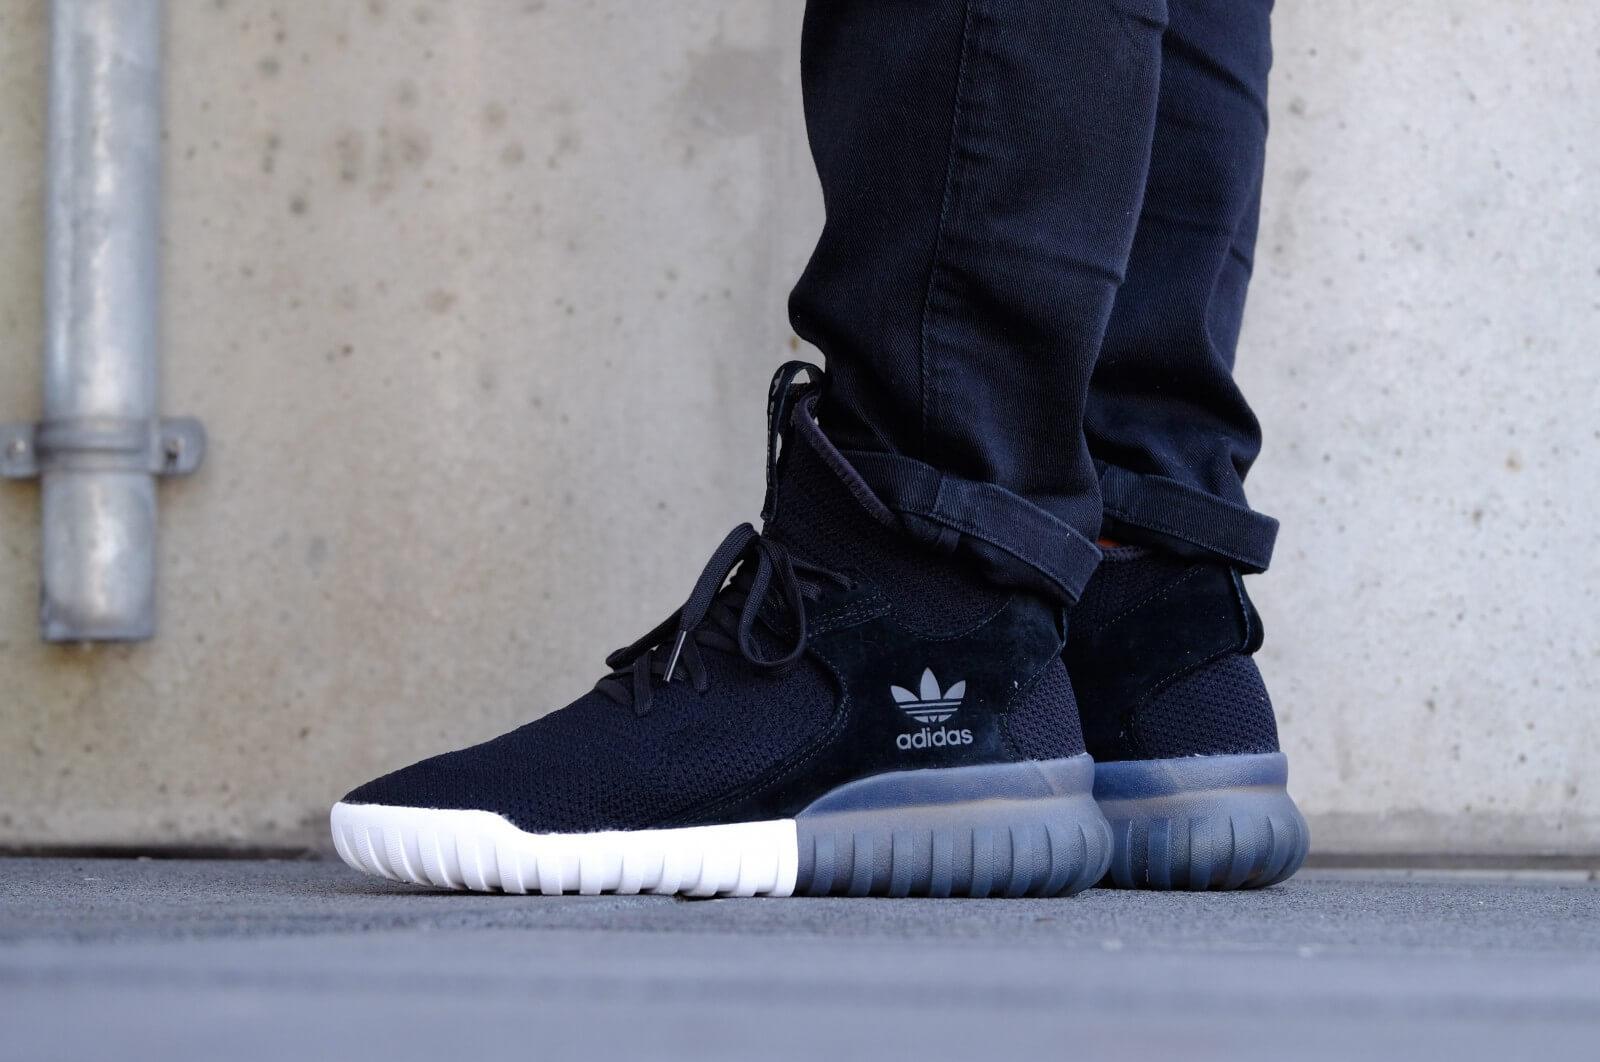 Adidas Tubular X Primeknit Black White